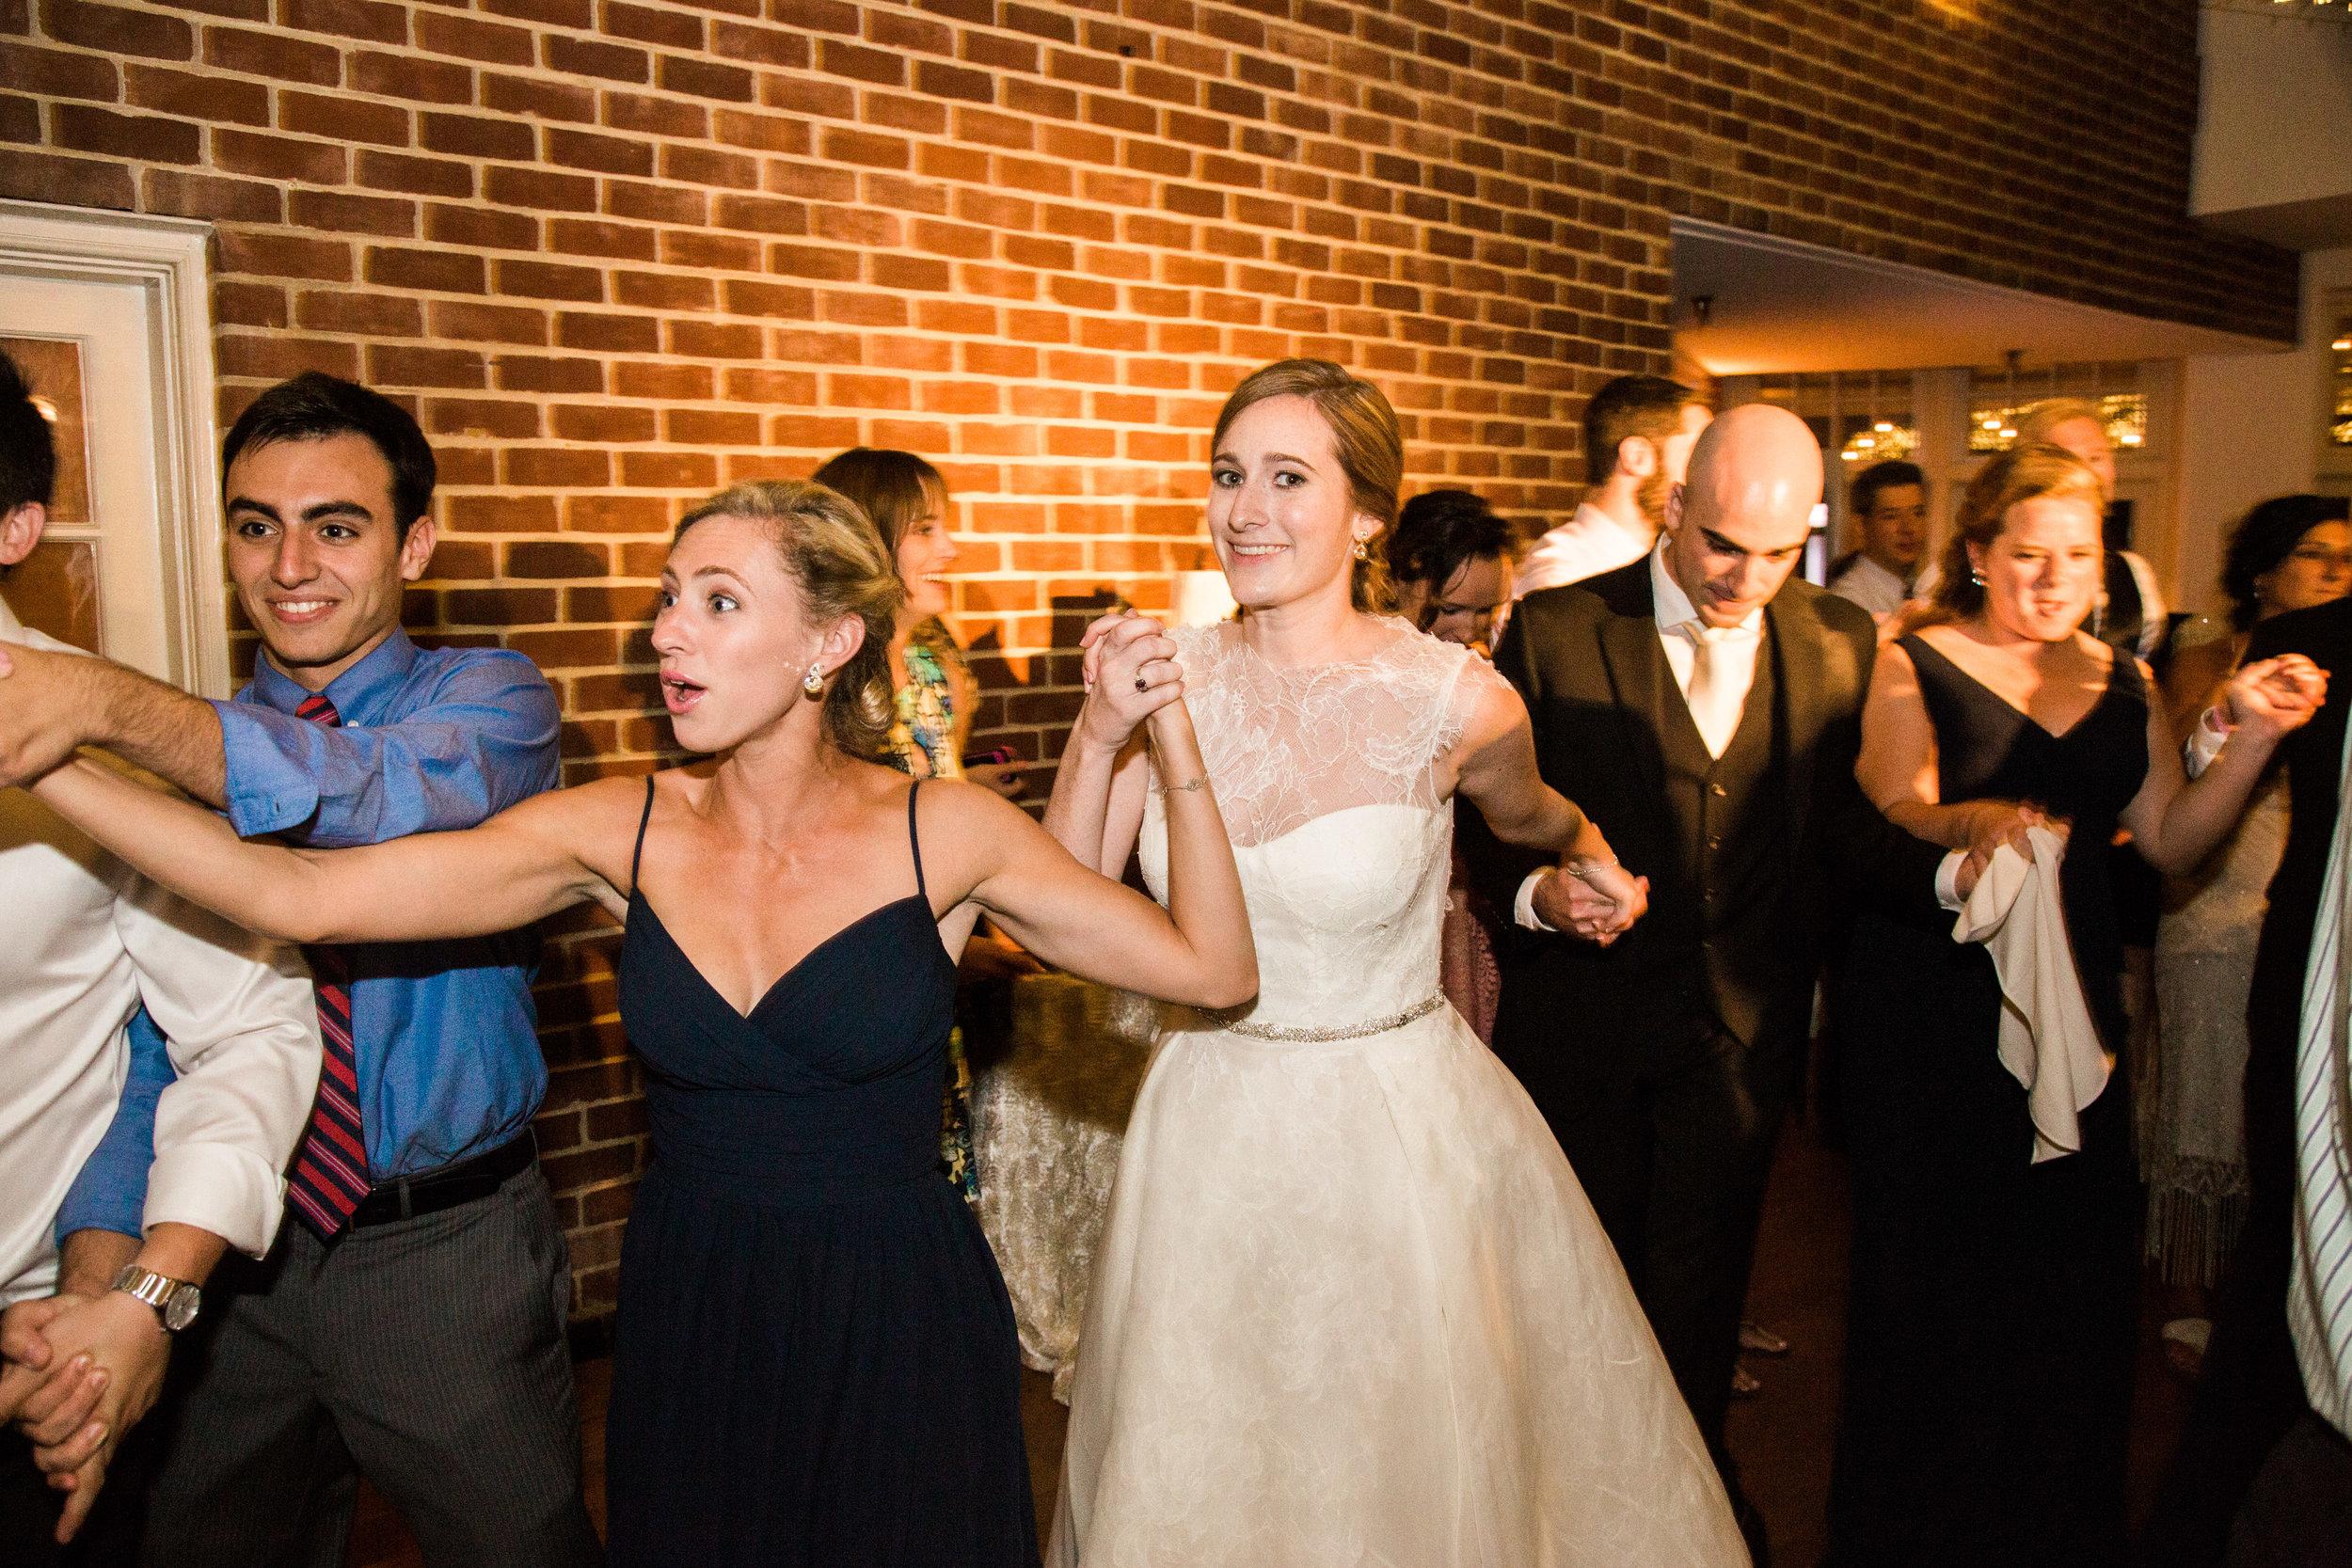 120-Governor-Calvert-Annapolis-Maryland-Wedding-MA17.jpg